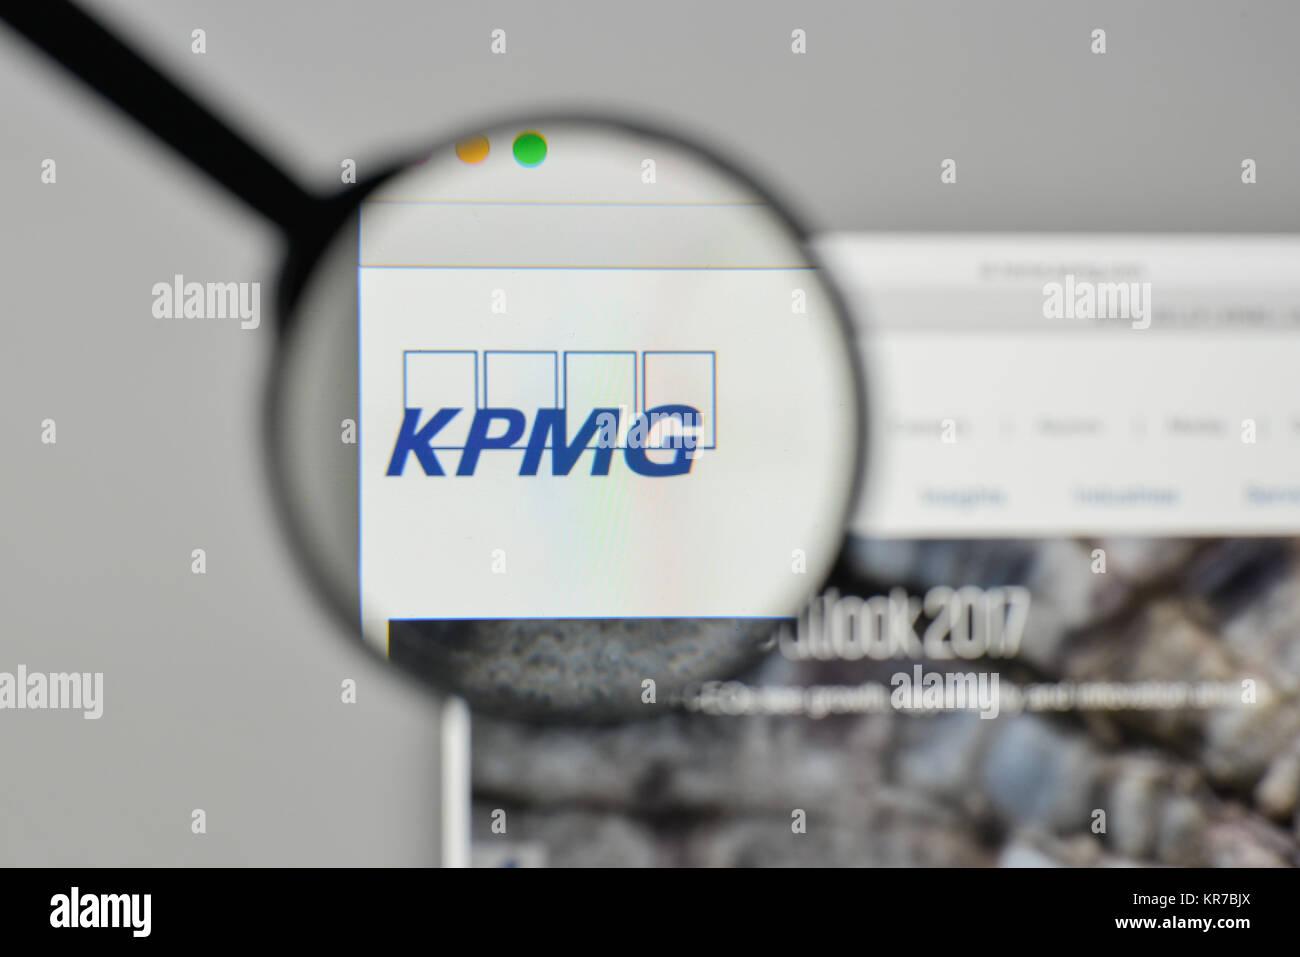 Milan, Italy - November 1, 2017: KPMG logo on the website